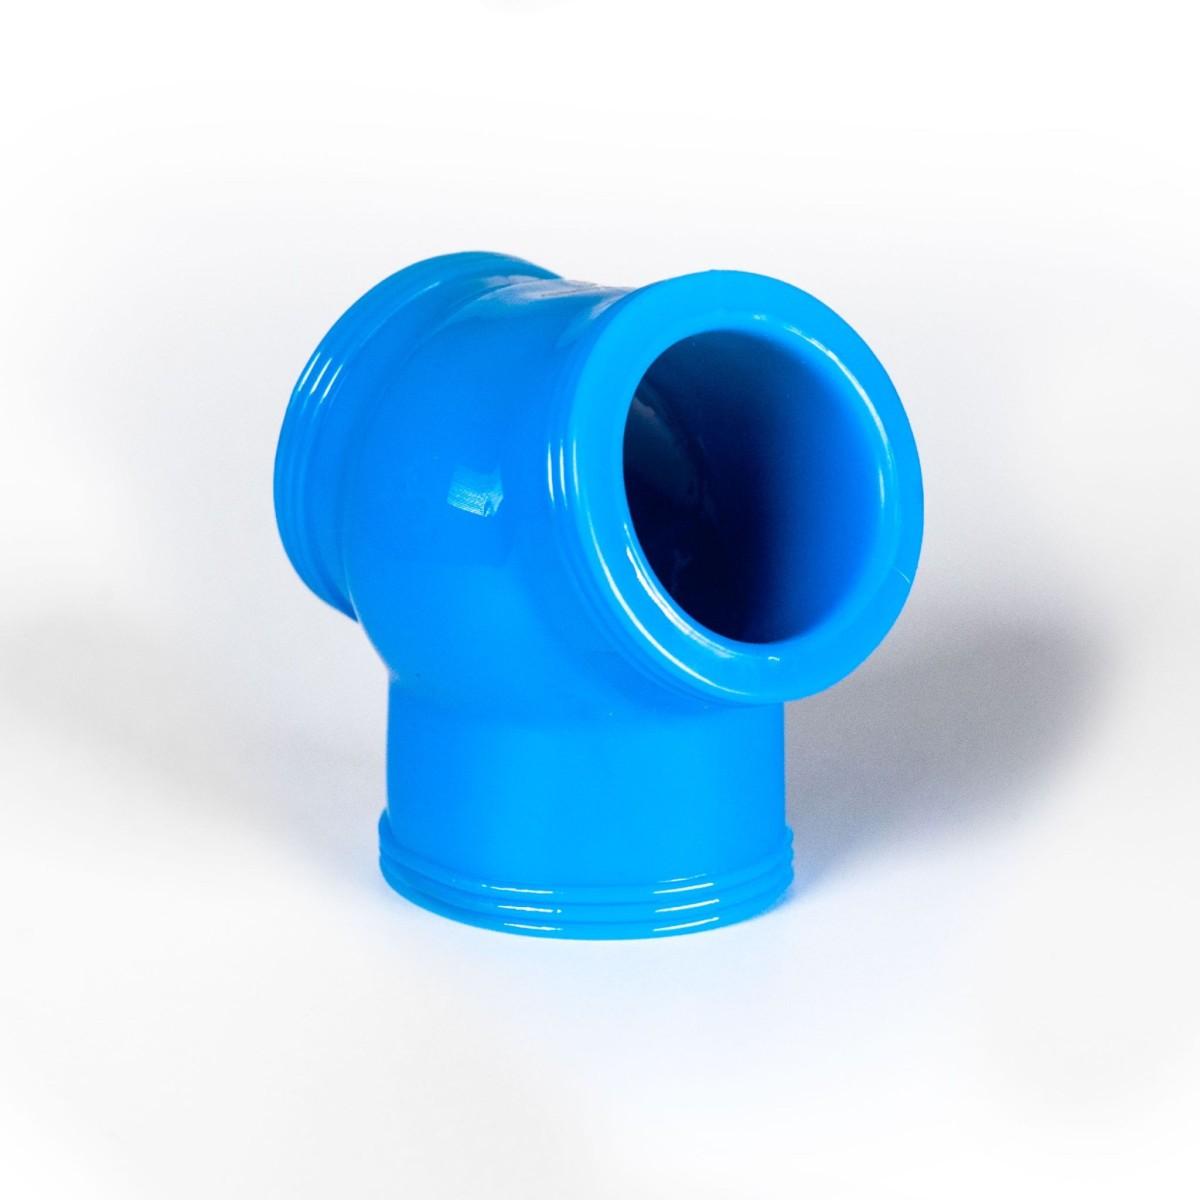 Zizi Megamen Cocksling Cock Ring & Ball Stretcher Fluo Blue